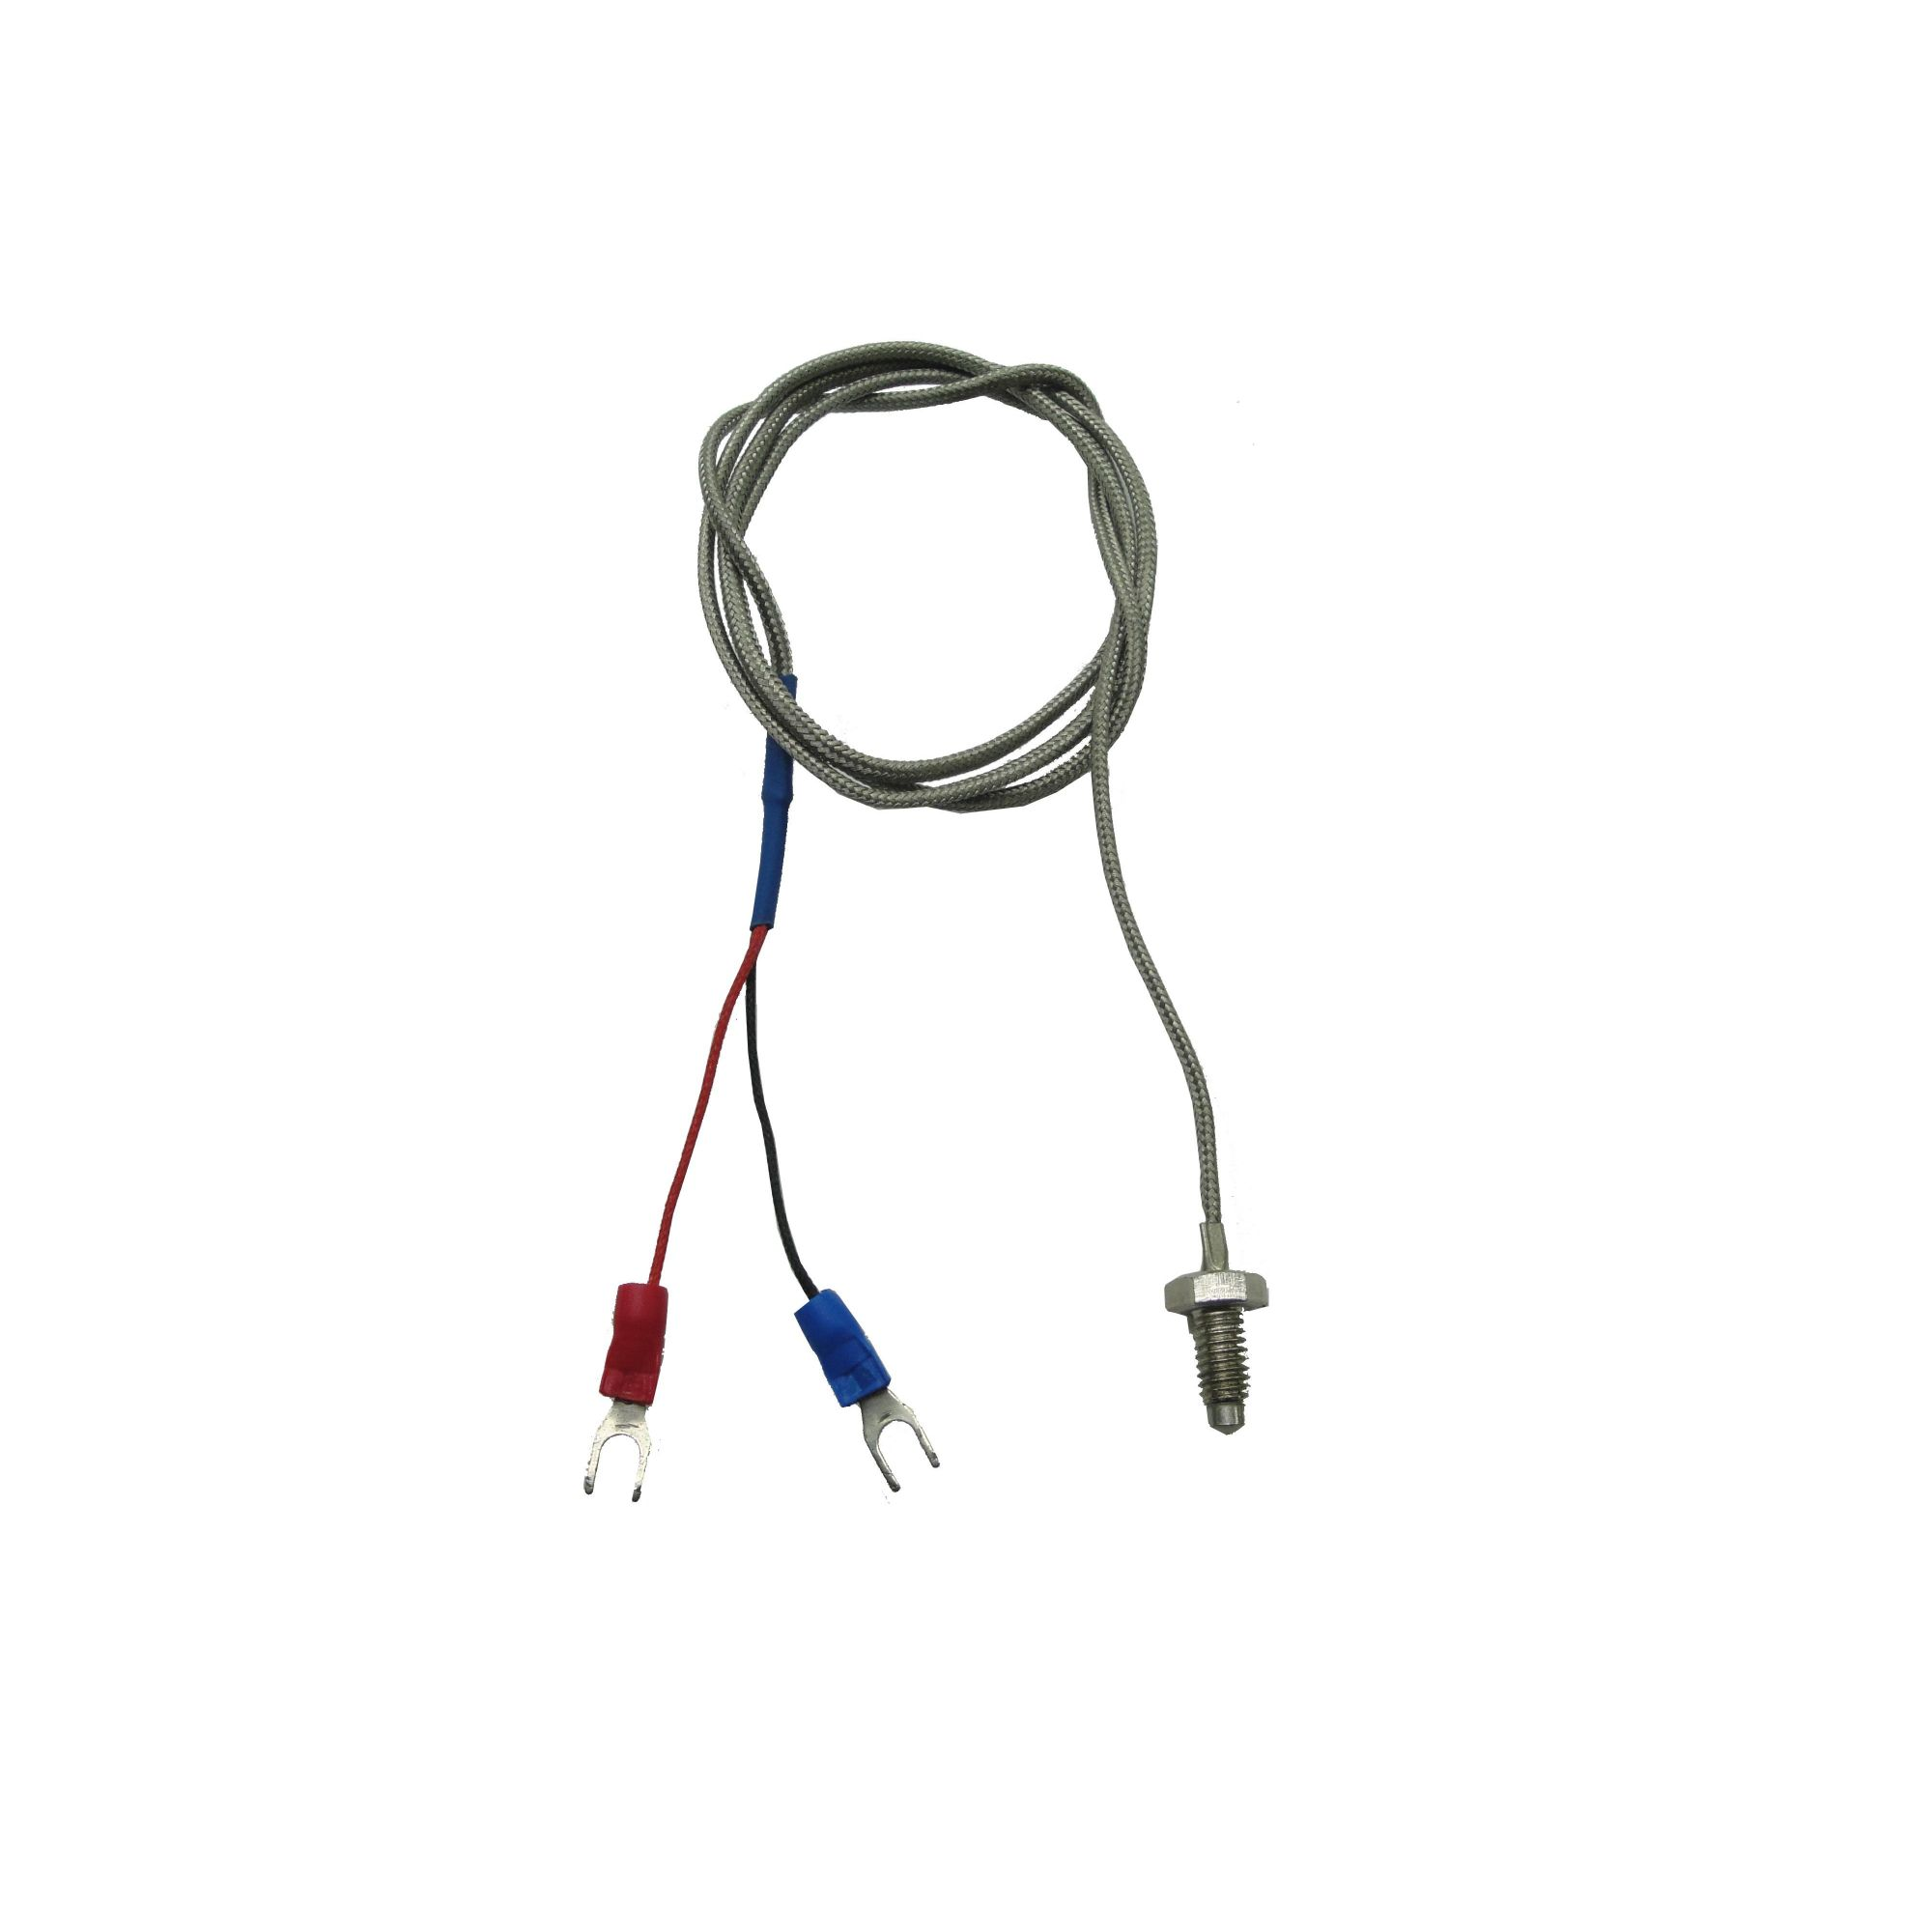 Sensor de Temperatura para Prensa Térmica - Modelo 1 (Sensor com Teminal Rosca)